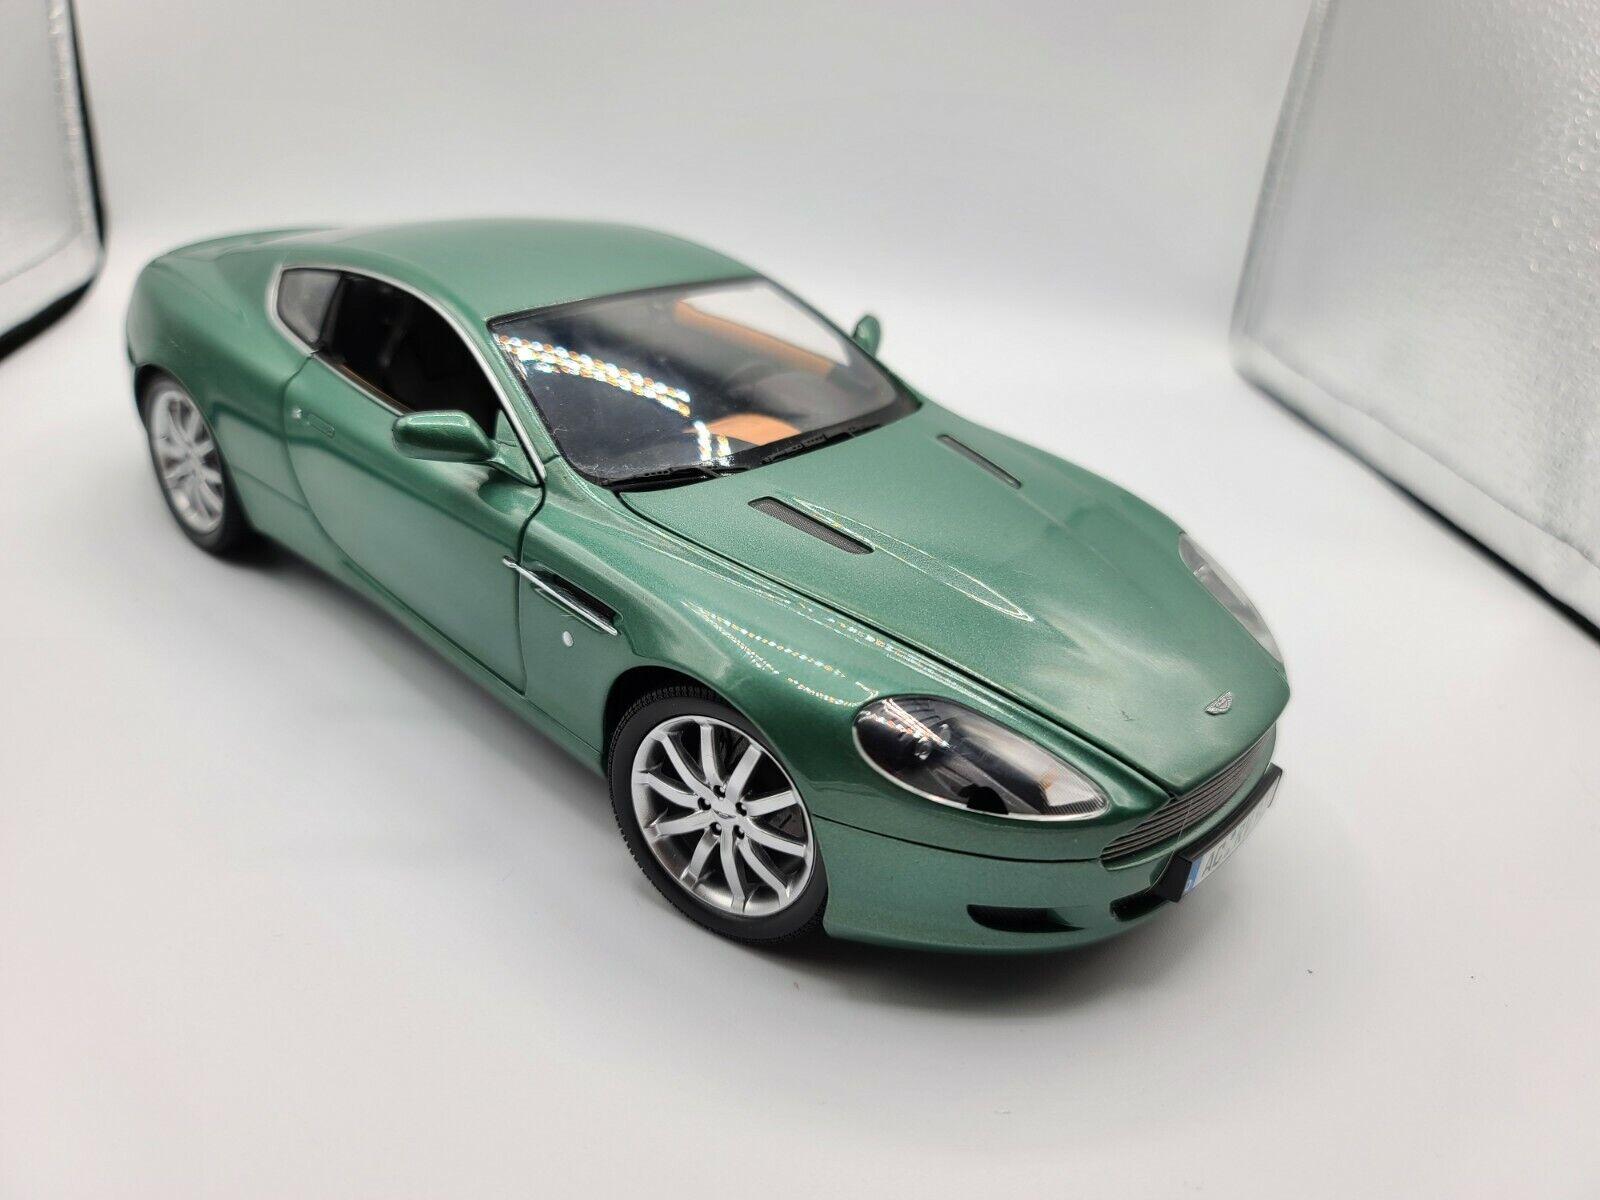 Minichamps Aston Martin Db9 Coupe 2003 1 18 For Sale Online Ebay